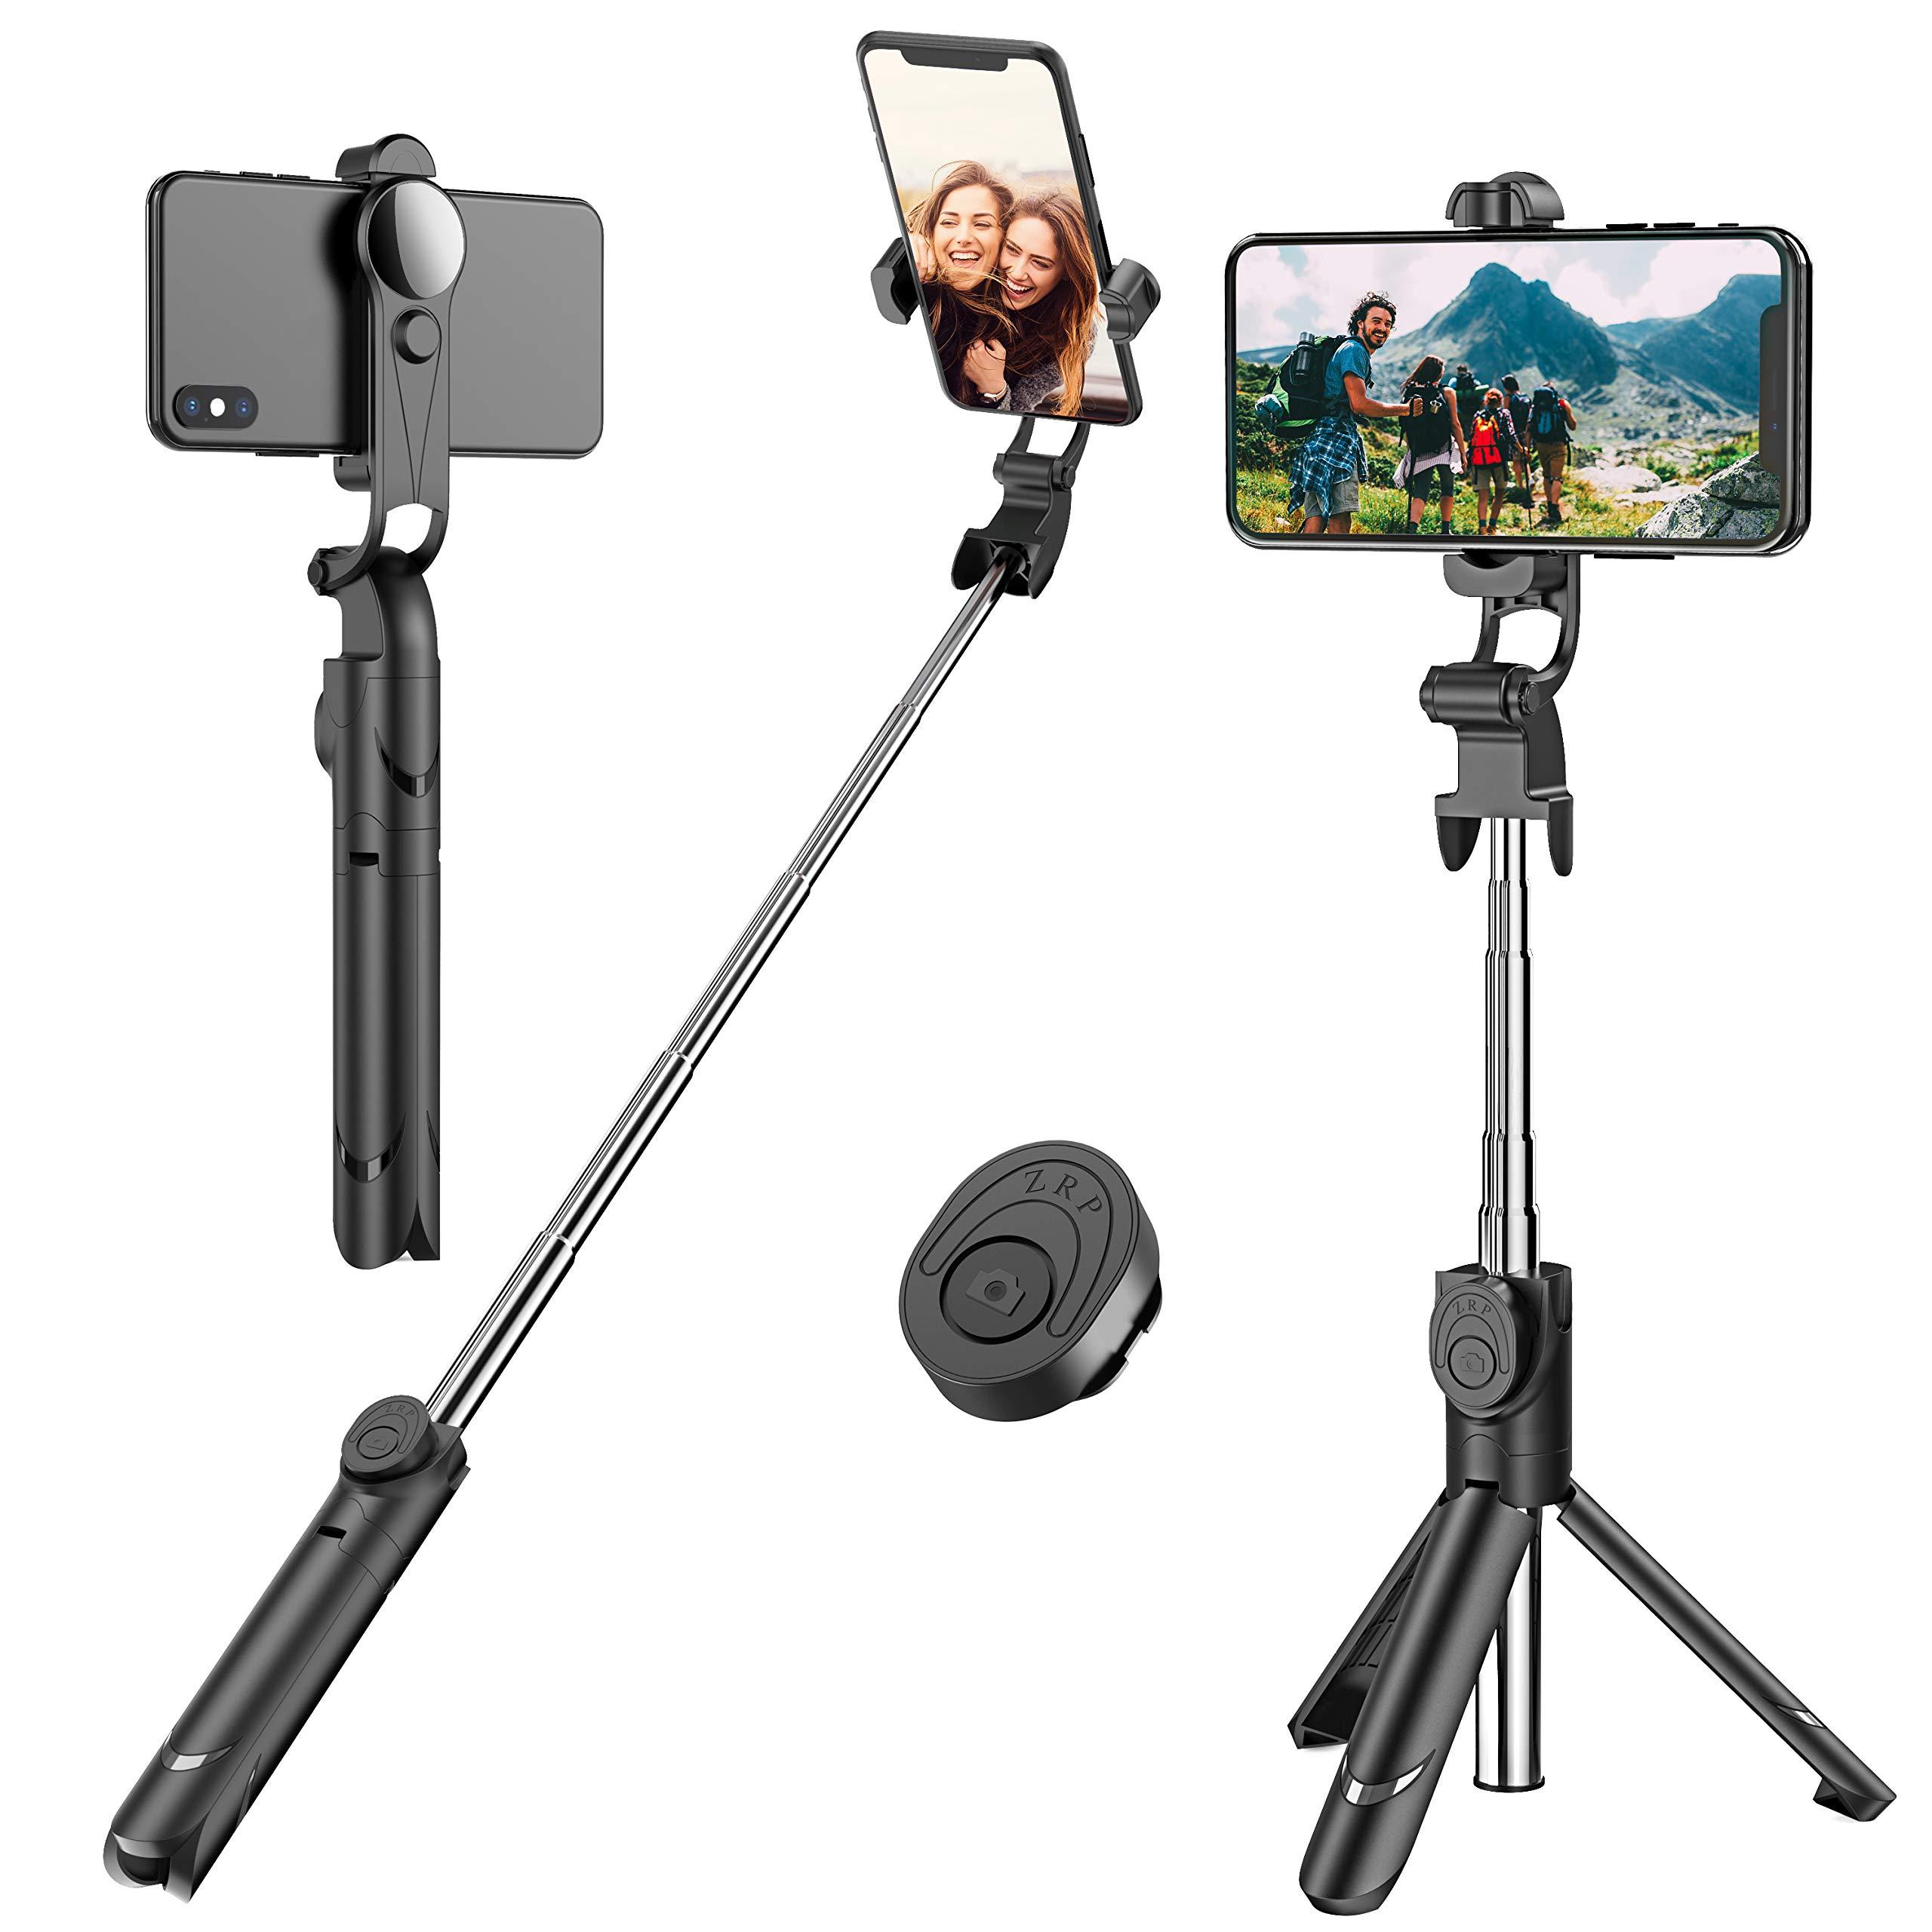 amazon.com - Selfie Stick, Extendable Selfie Stick Tripod with Detachable Wireless Remote and Tripod Stand Selfie Stick for iPhone X/iPhone 8/8 Plus/iPhone 7/7 Plus, Galaxy S9/S9 Plus/S8/S8 Plus/Note8,Huawei,More